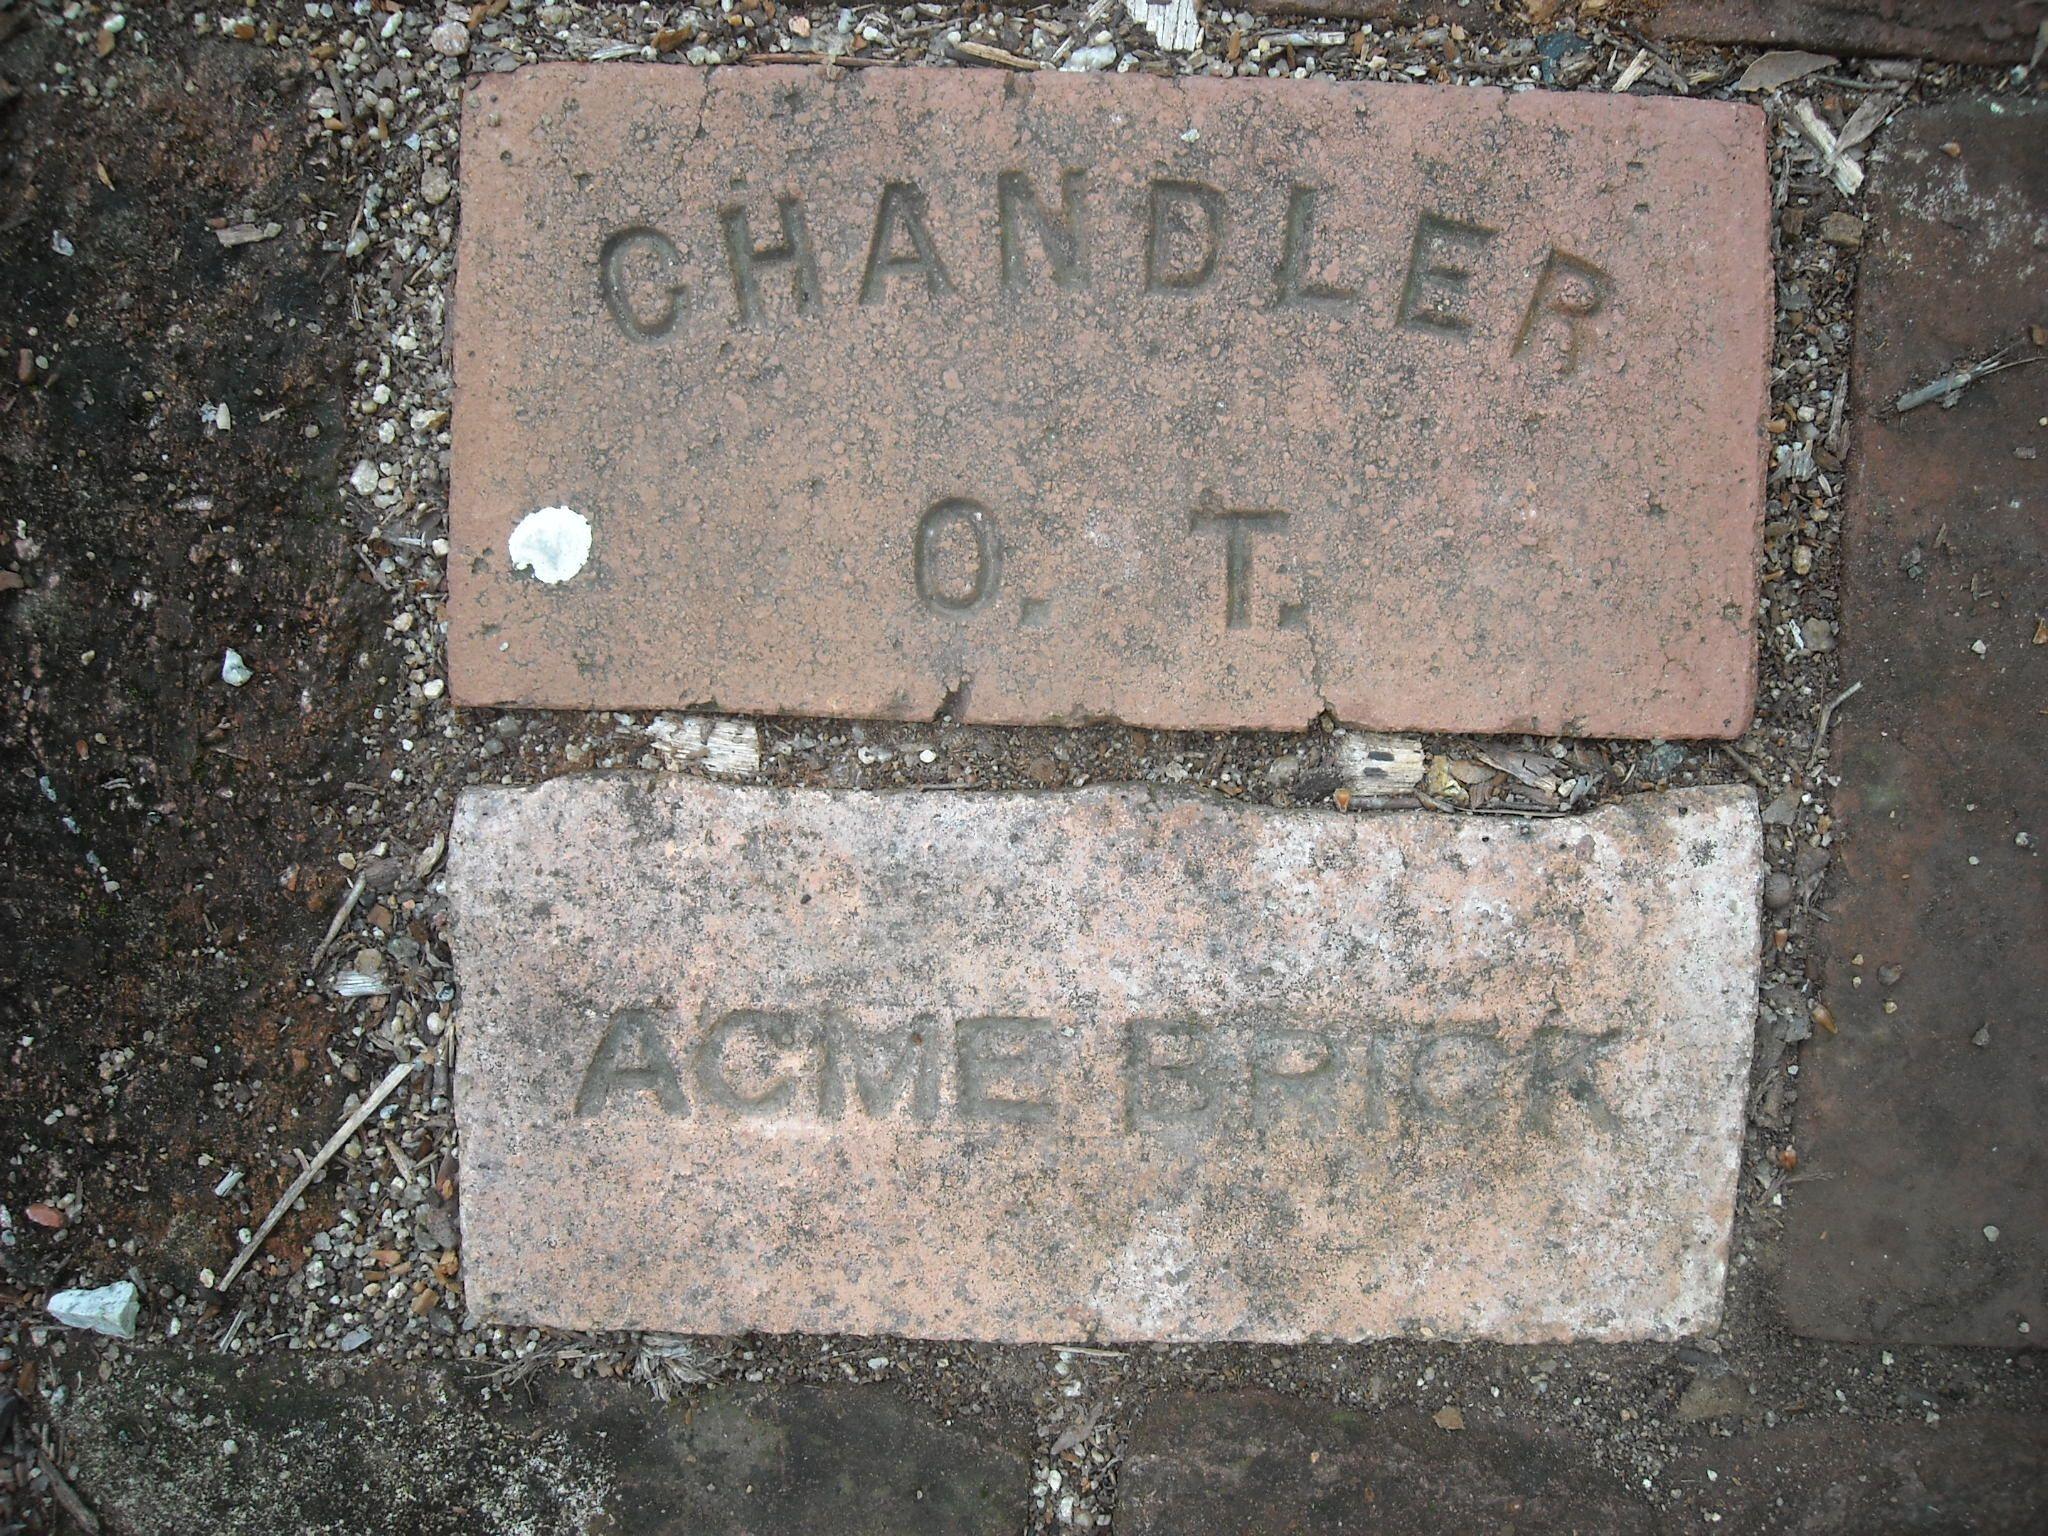 Chandler ot oklahoma territory and acme brick